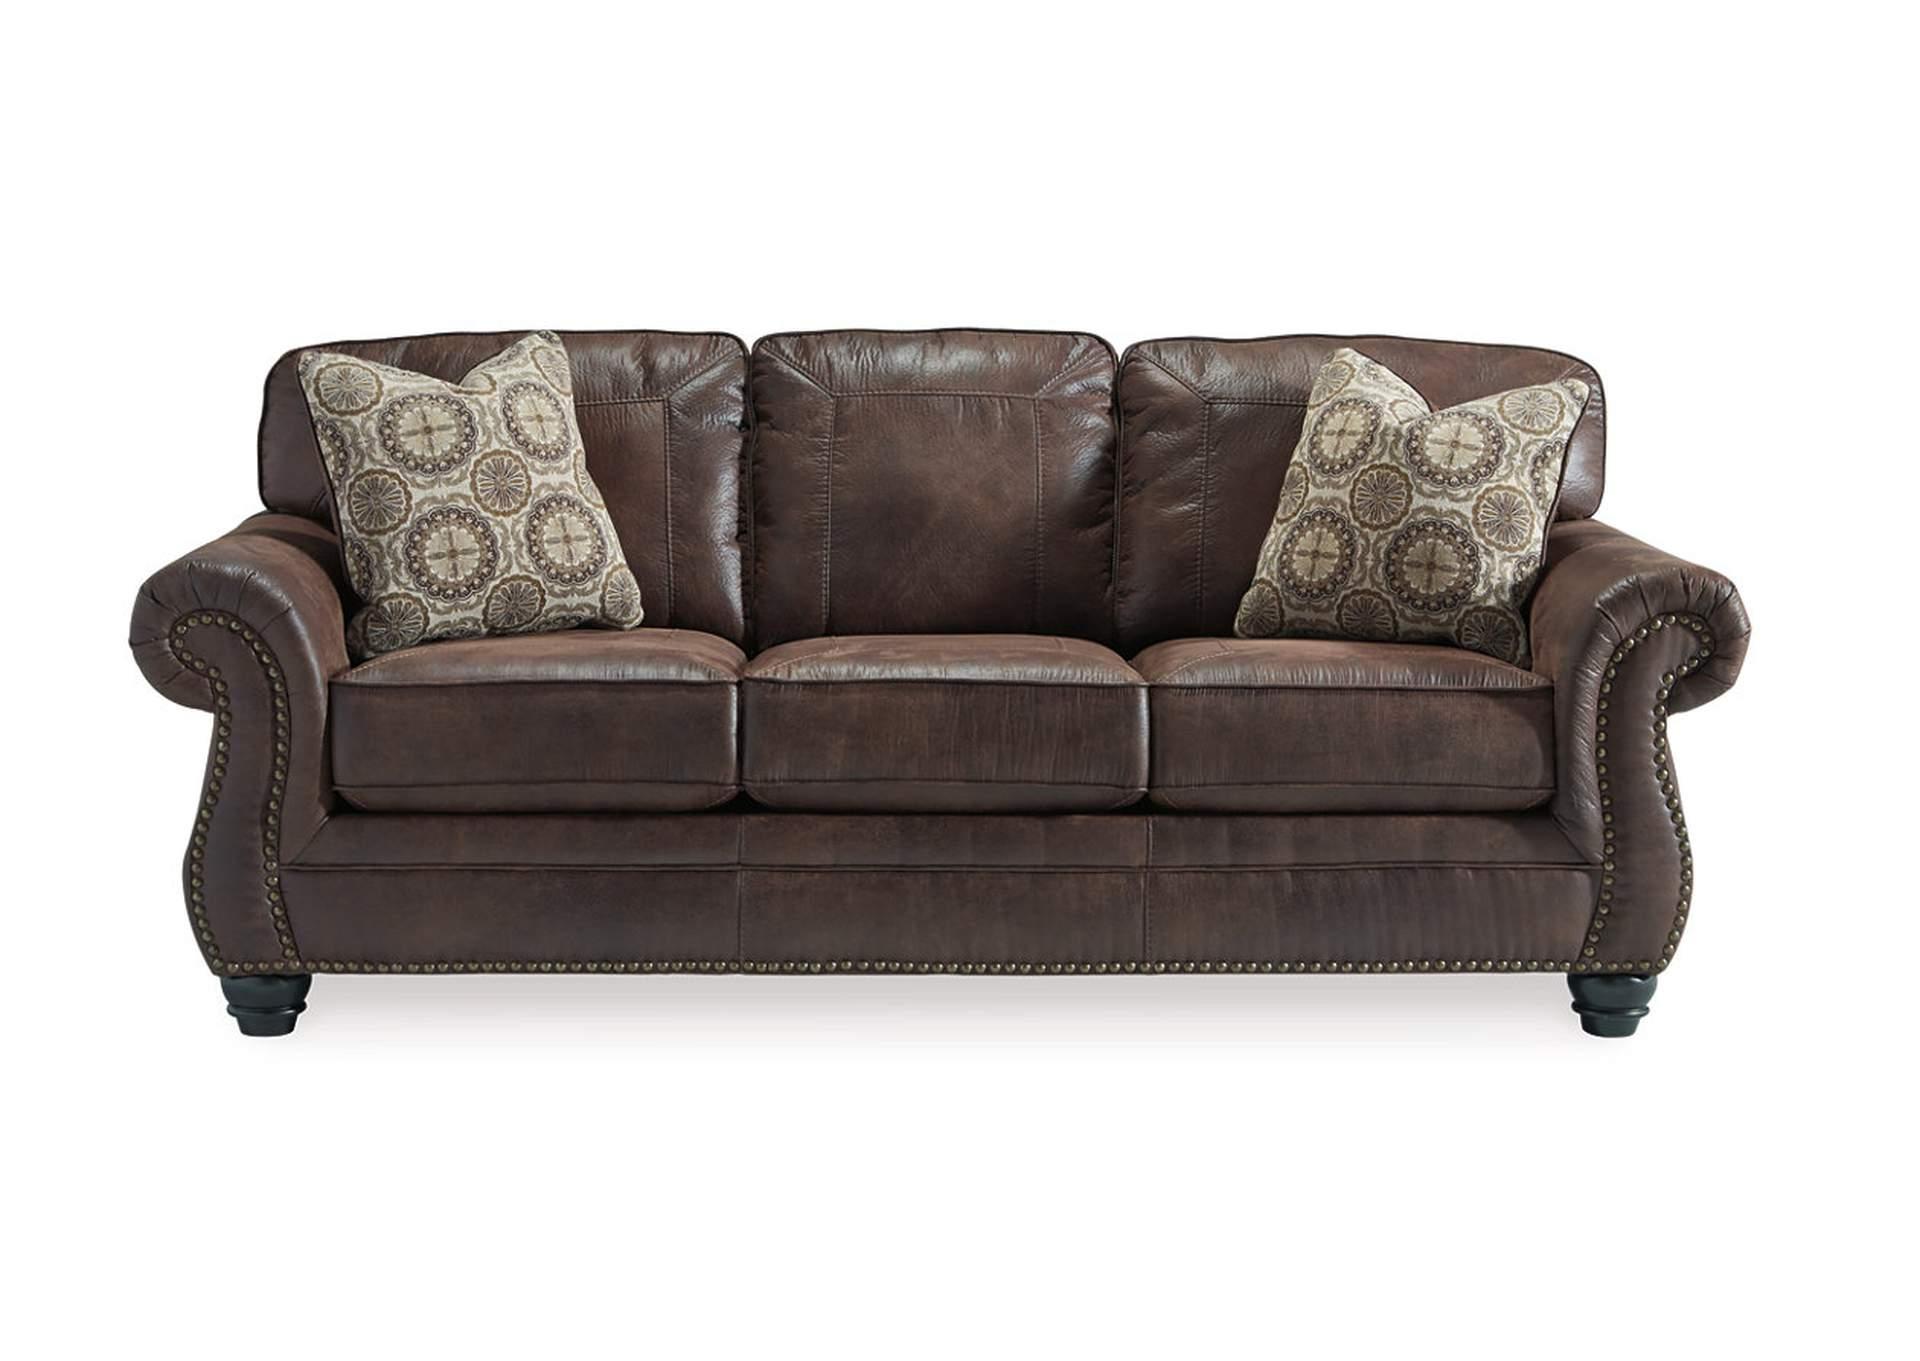 Furniture liquidators home center breville espresso sofa for Liquidation divan